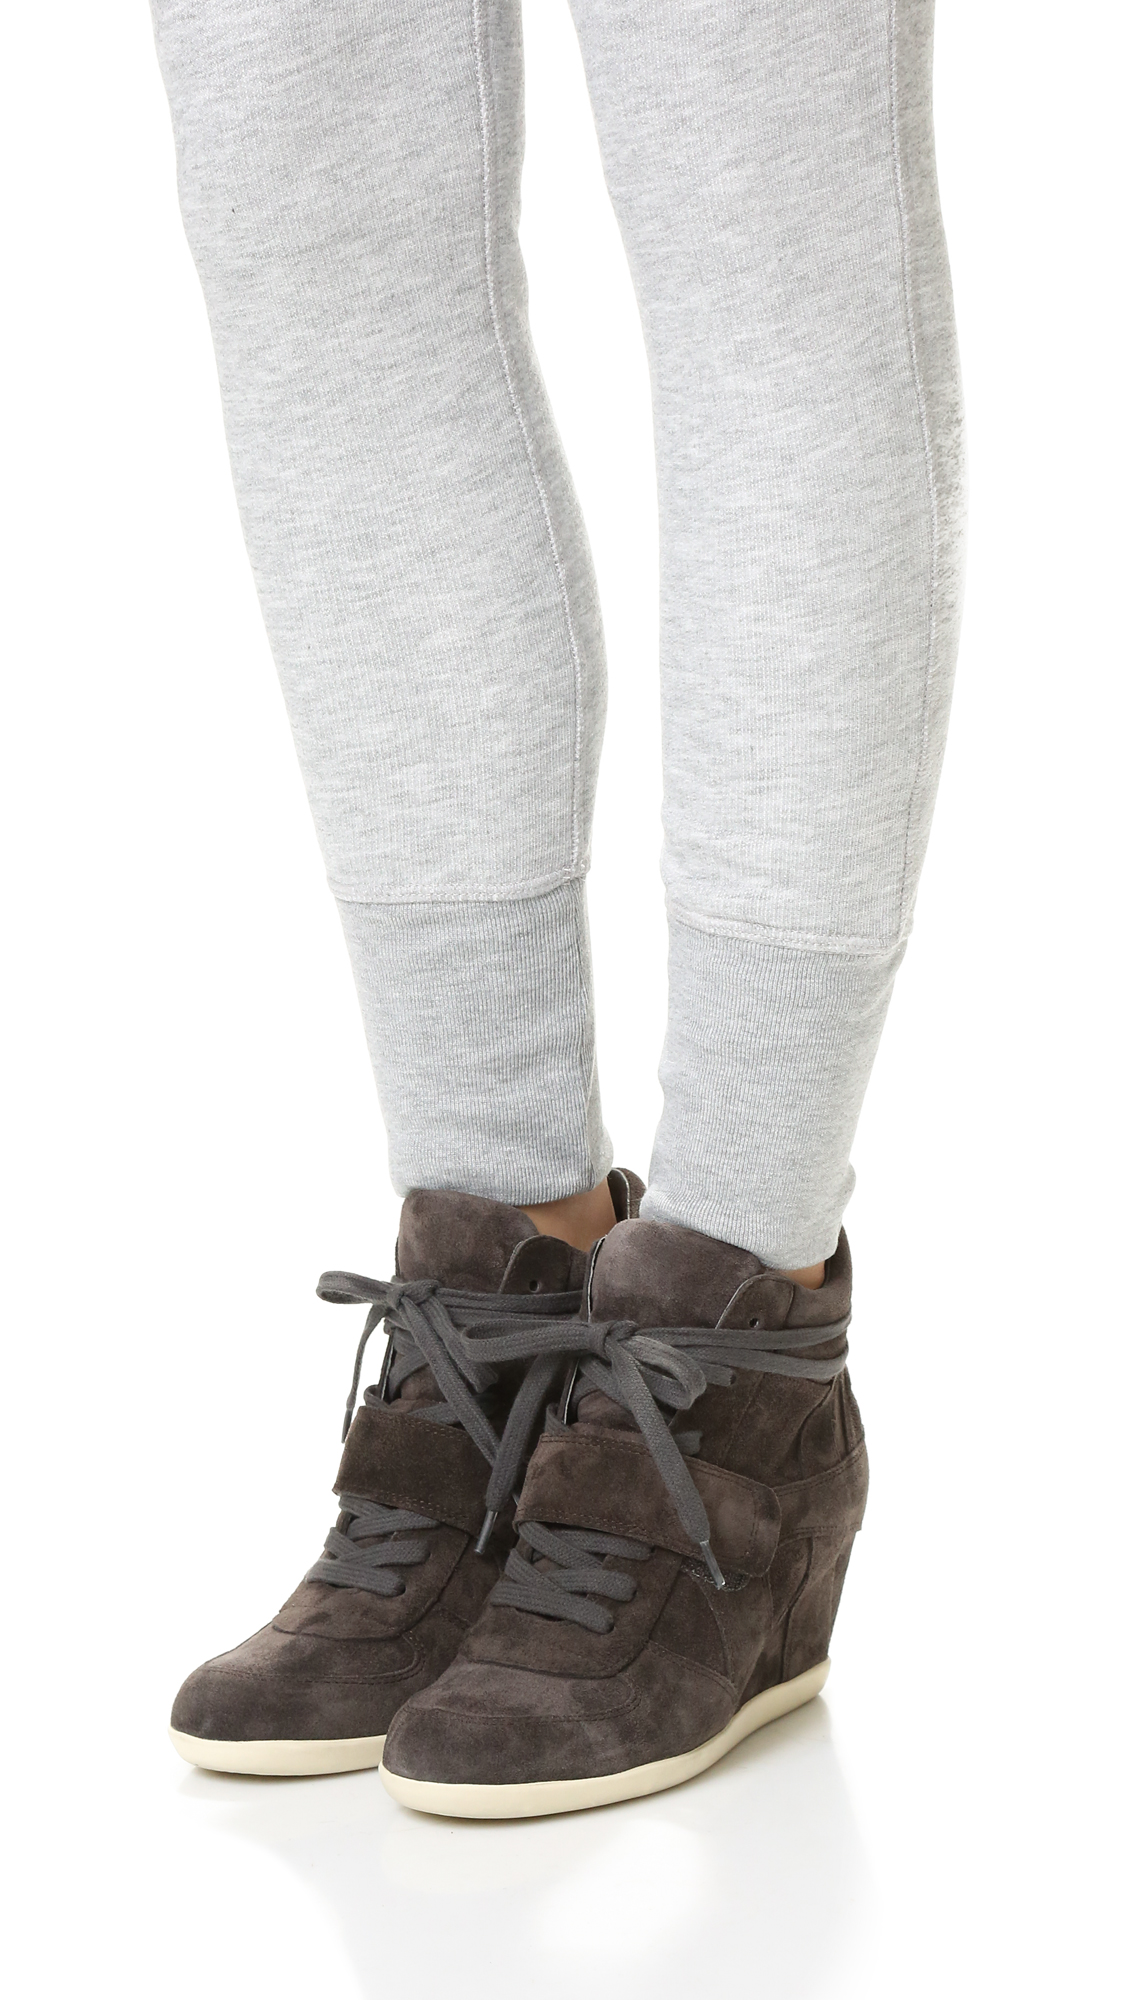 8ada4d20d794 Ash Bowie Wedge Sneakers